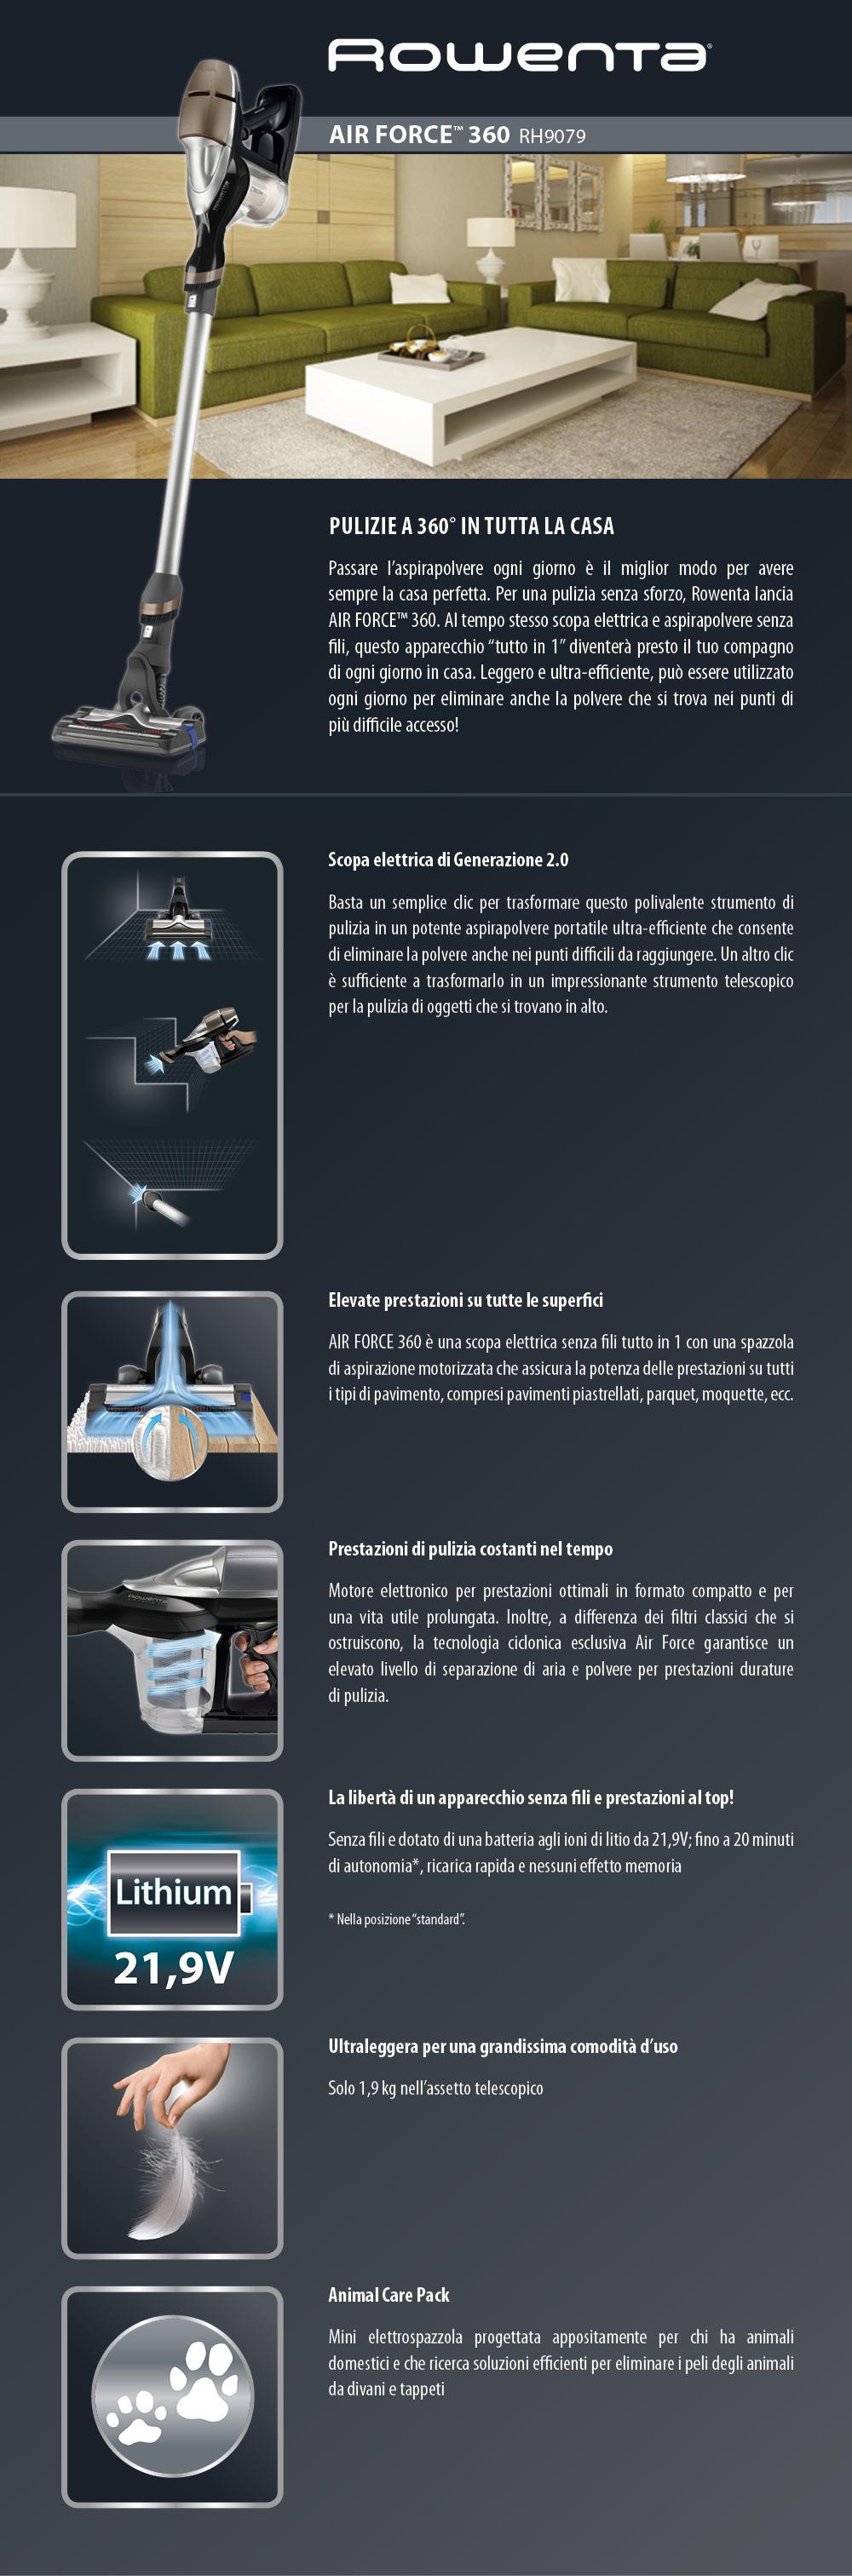 rowenta rh9079 air force 360 scopa elettrica senza fili e sacco versatile con kit animal care. Black Bedroom Furniture Sets. Home Design Ideas